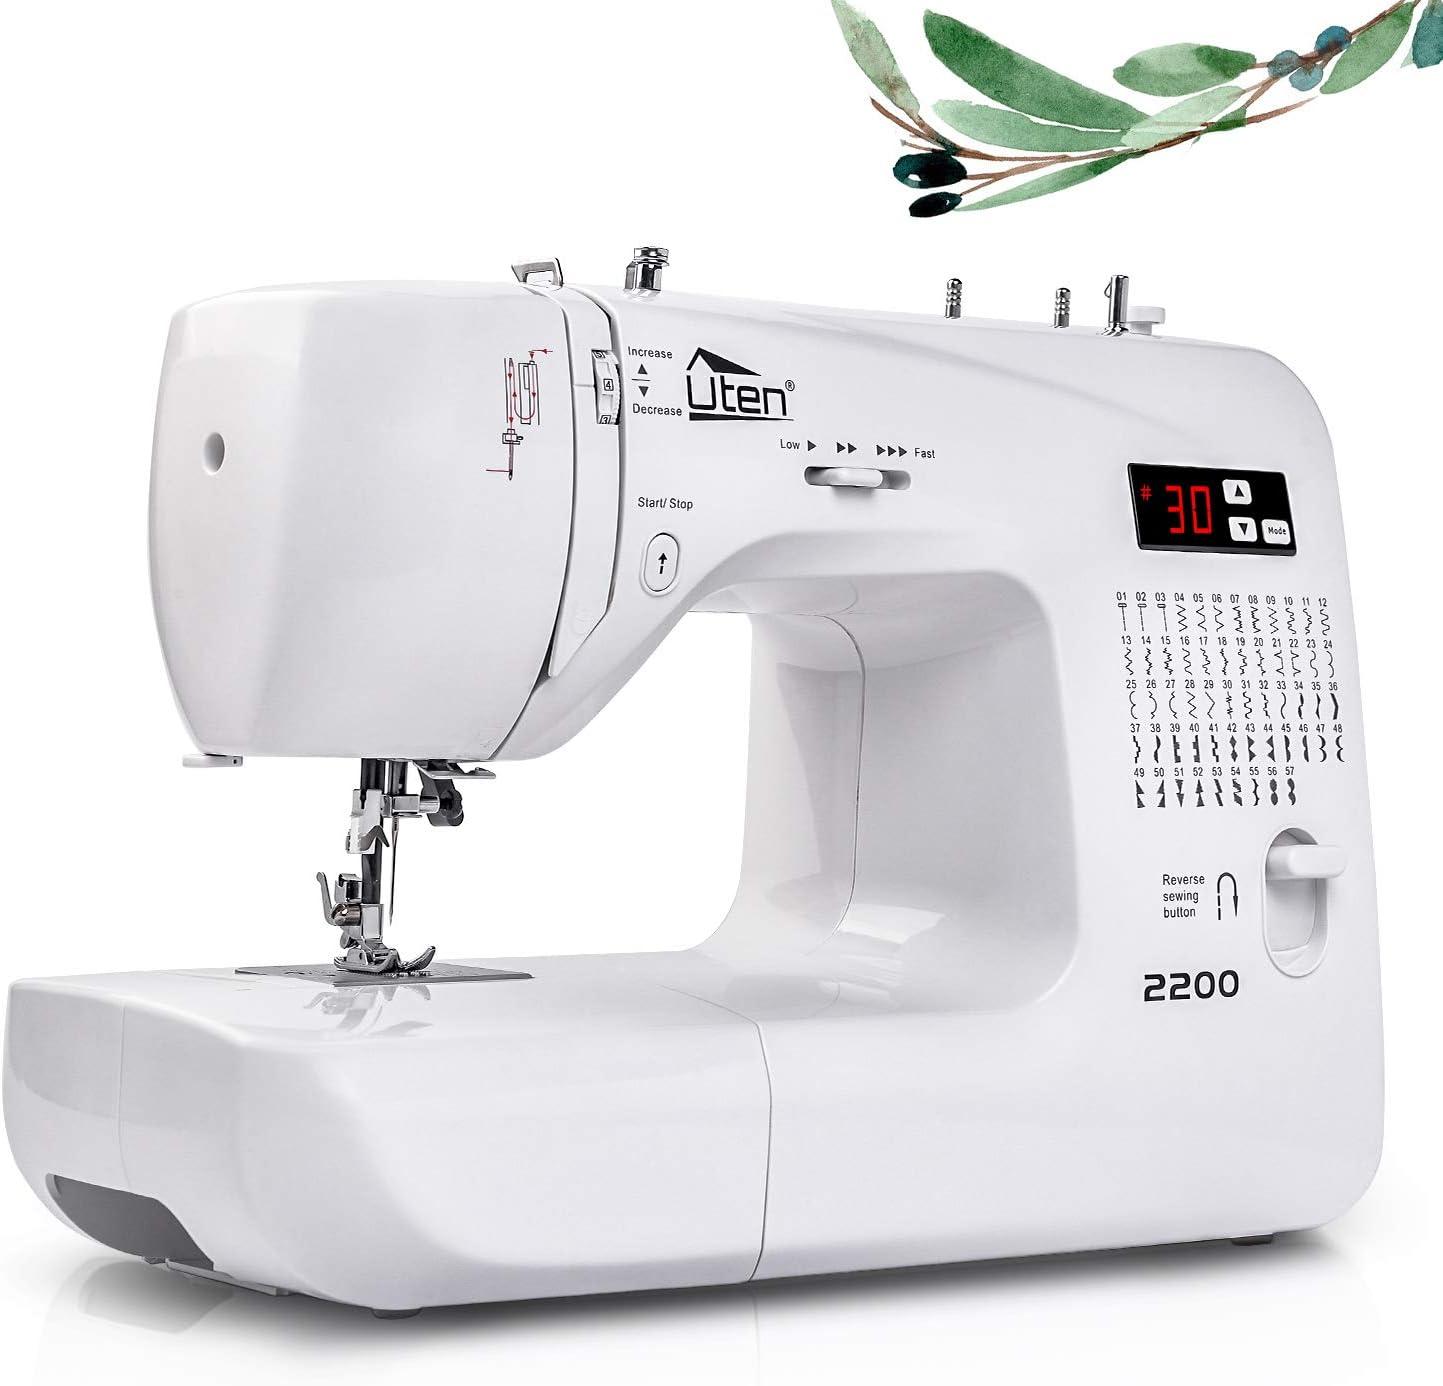 Máquina de Coser Portatil Electrica 60 Puntadas maquina coser manual con Luz de LED